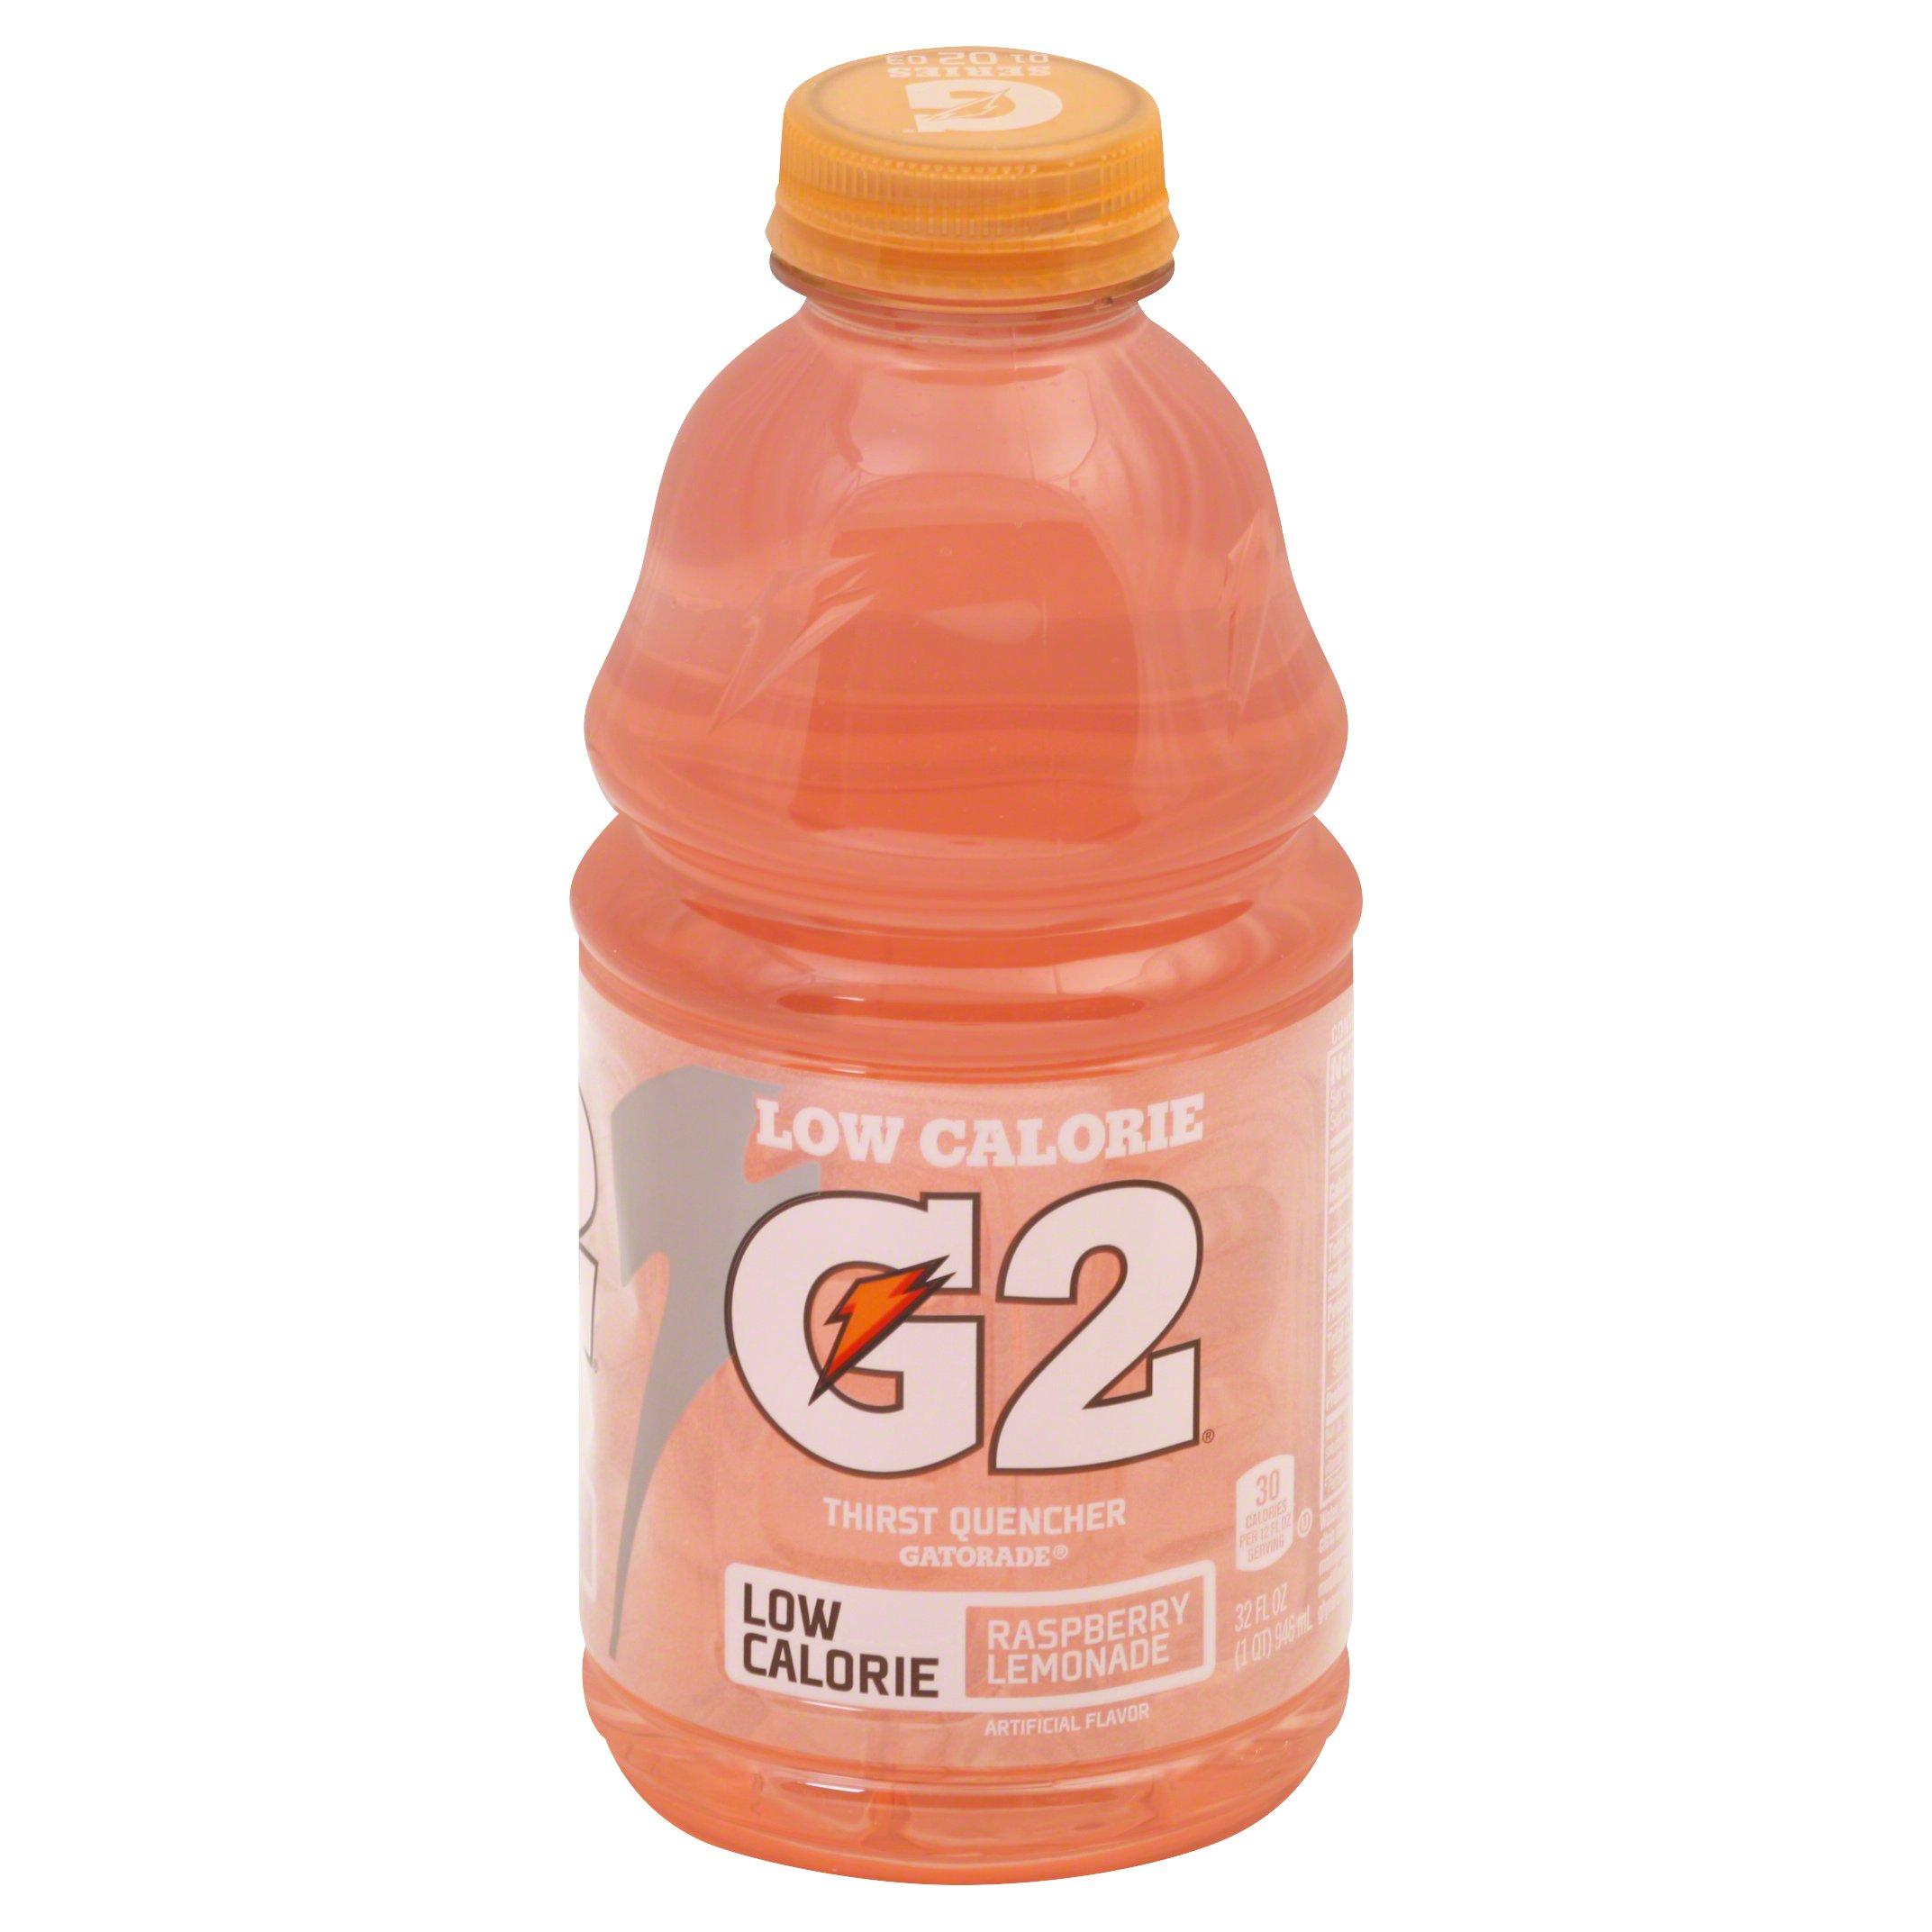 Gatorade Perform 02 Raspberry Lemonade Low Ca 32OZ 12-Pack